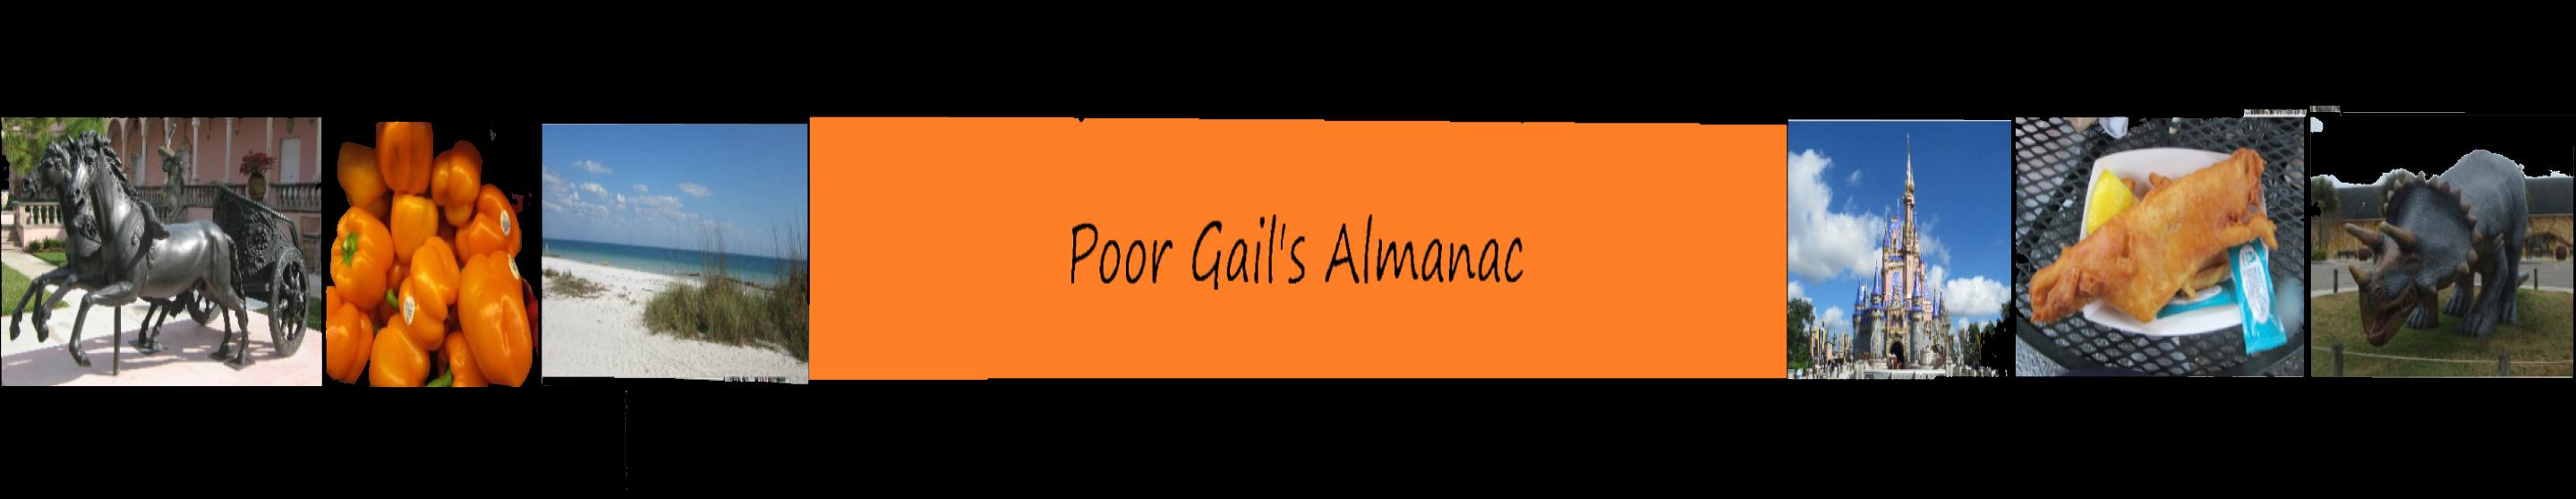 Poor Gail's Almanac